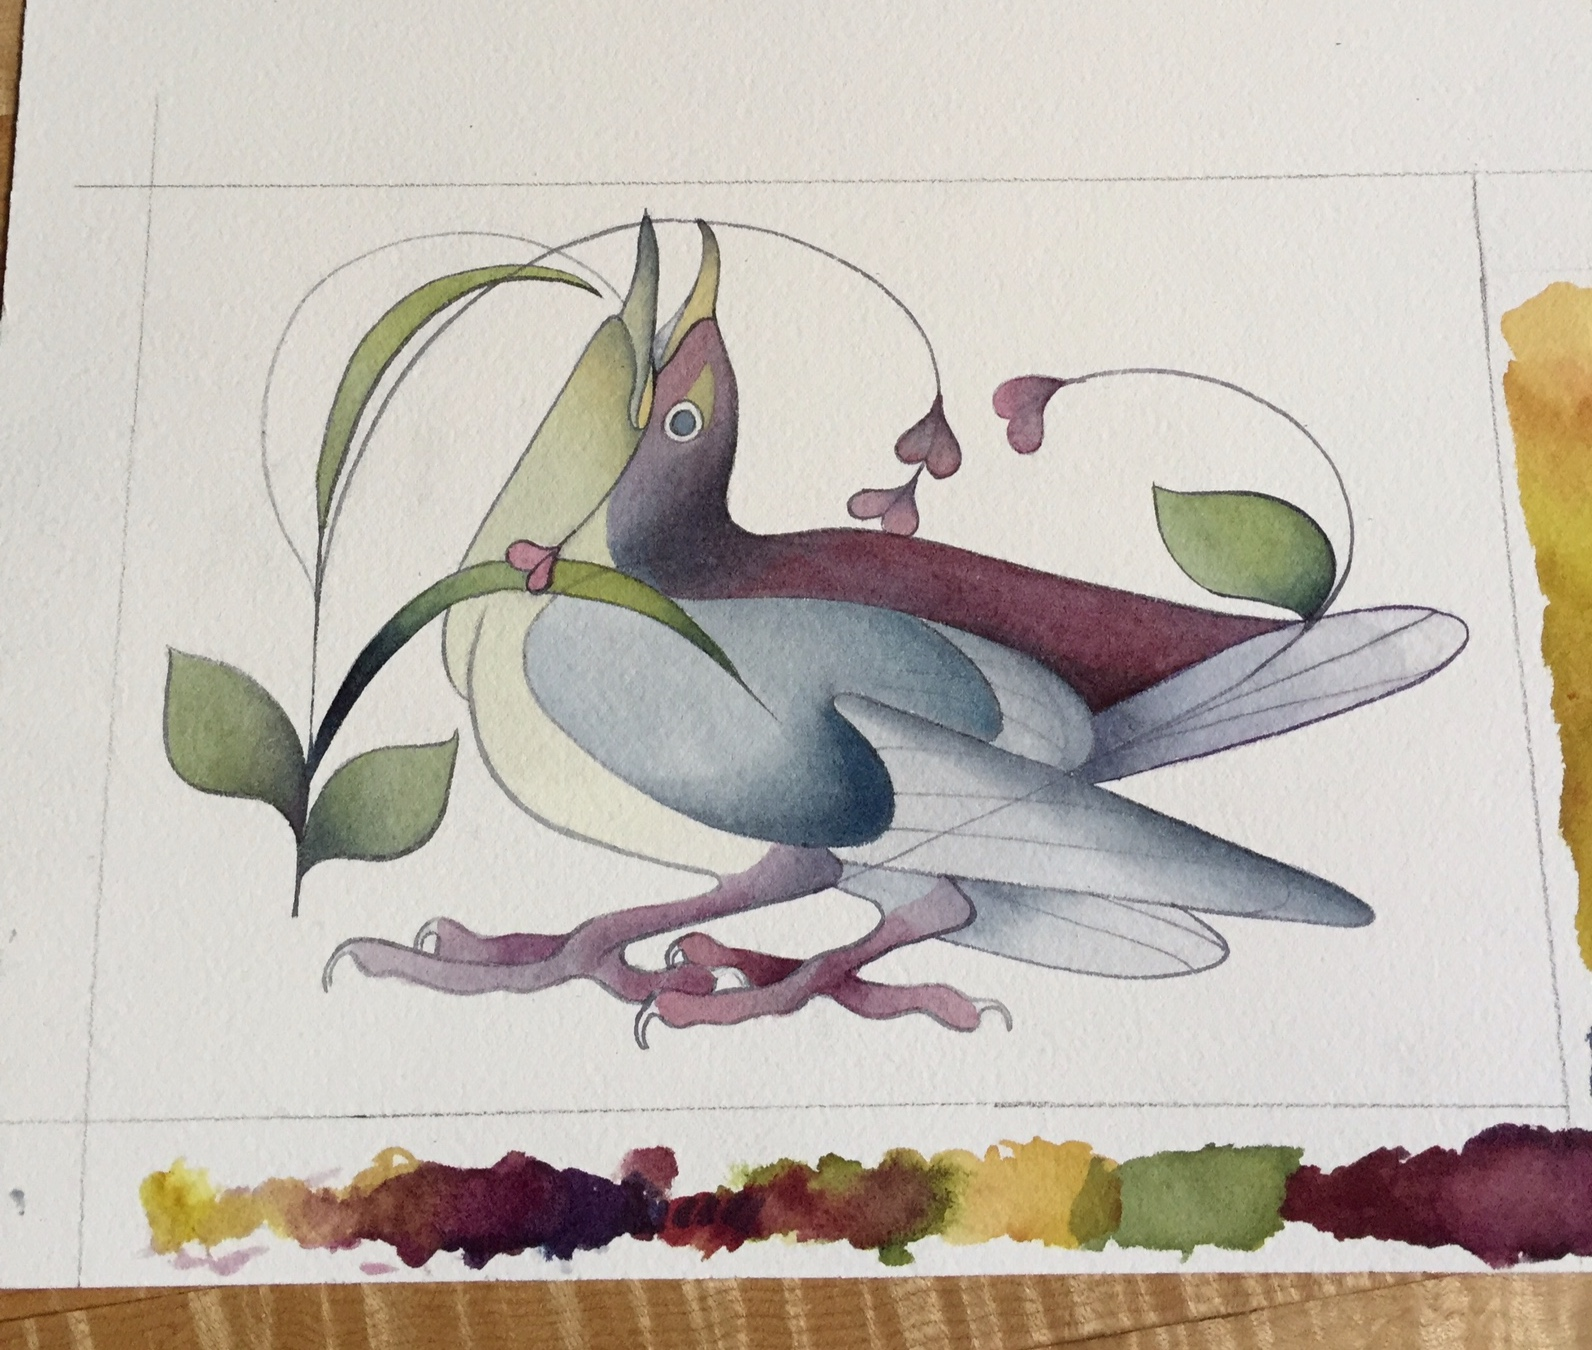 SHCP+haven+BK+watercolor1.jpg